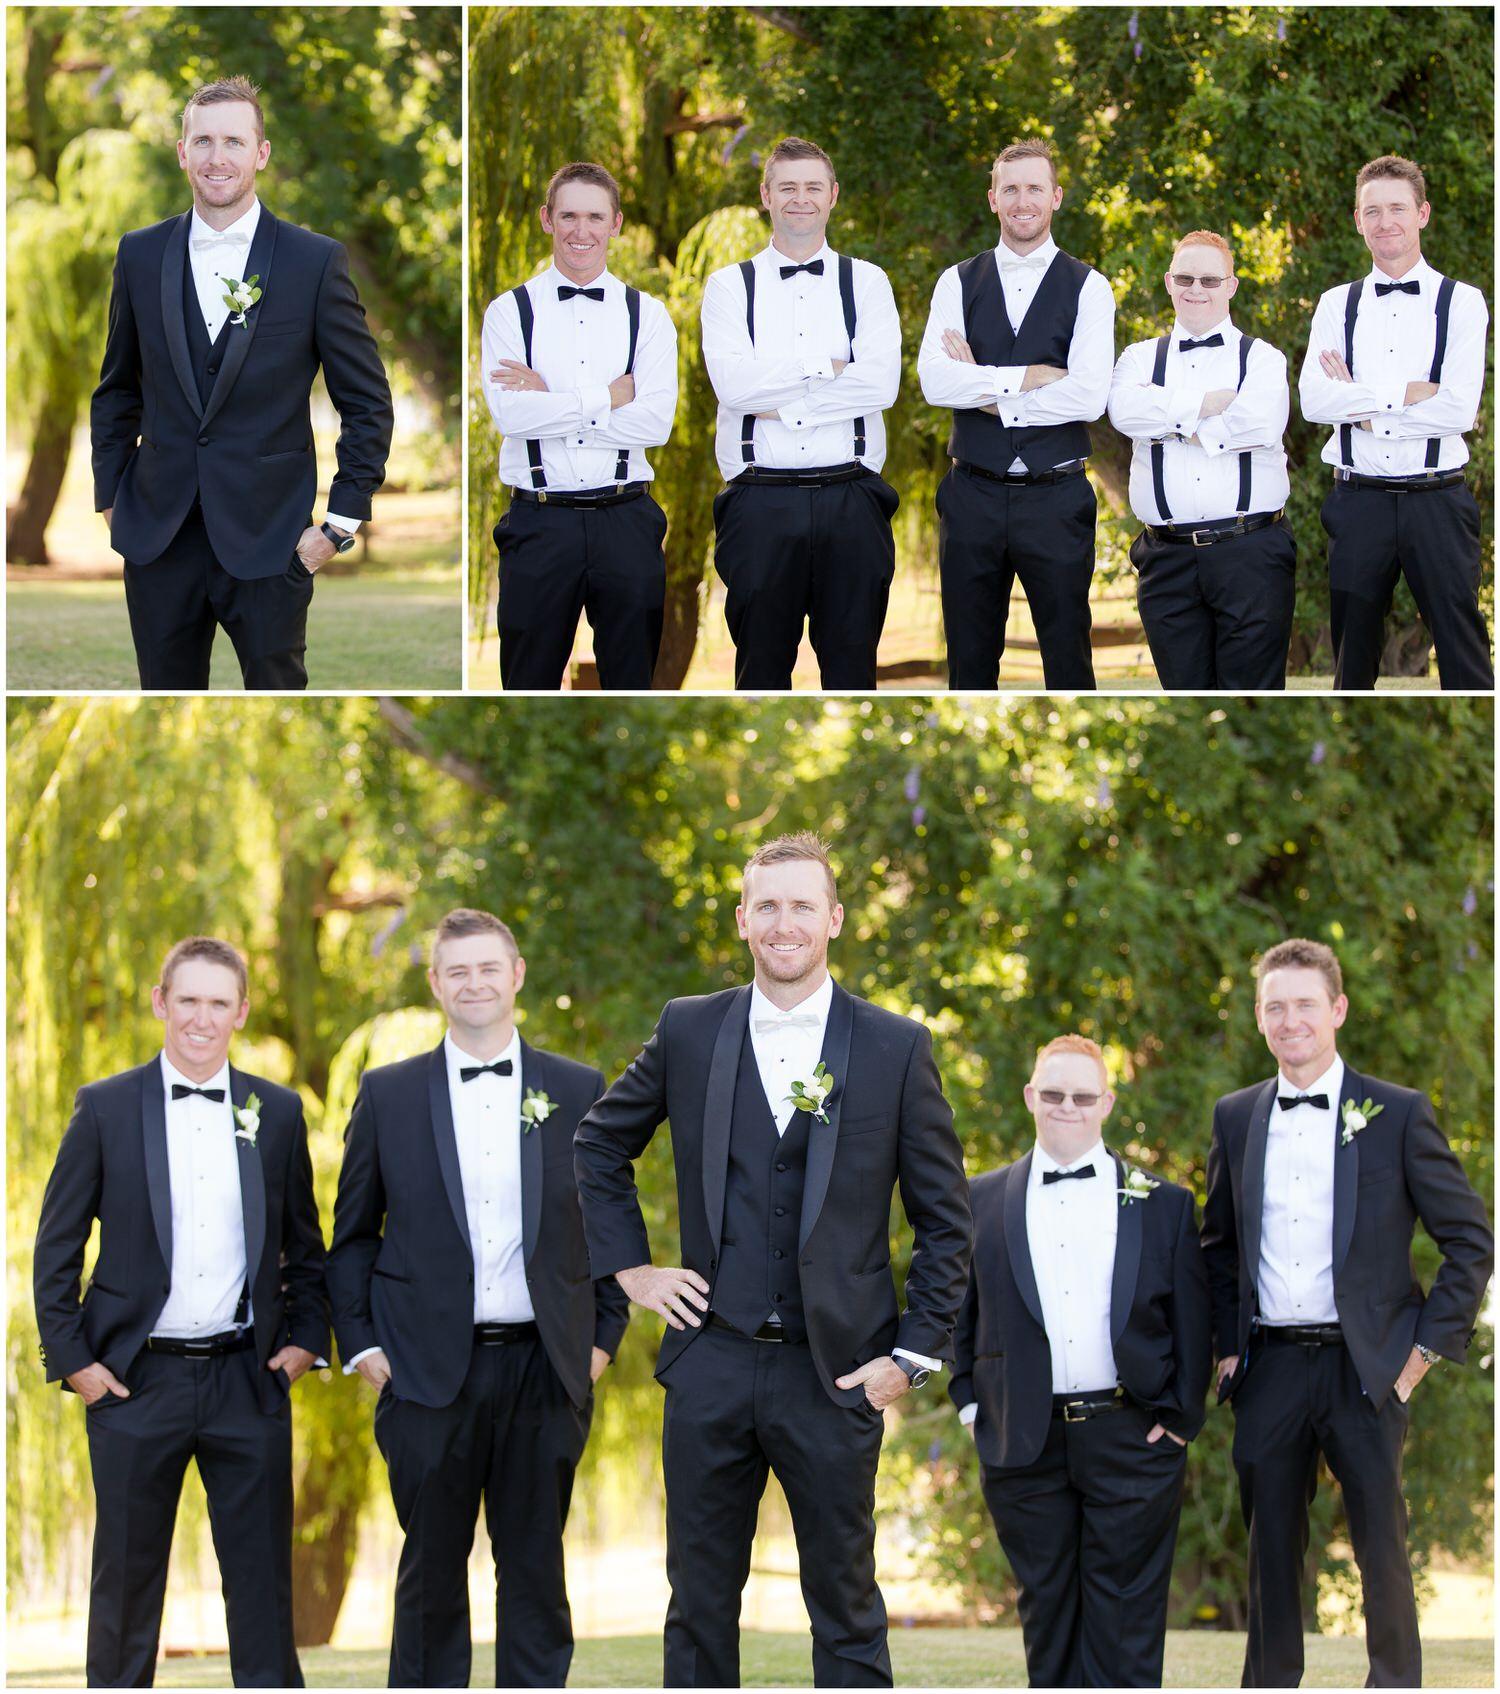 Dubbo Wedding Photography - Lazy River Estate Wedding 12